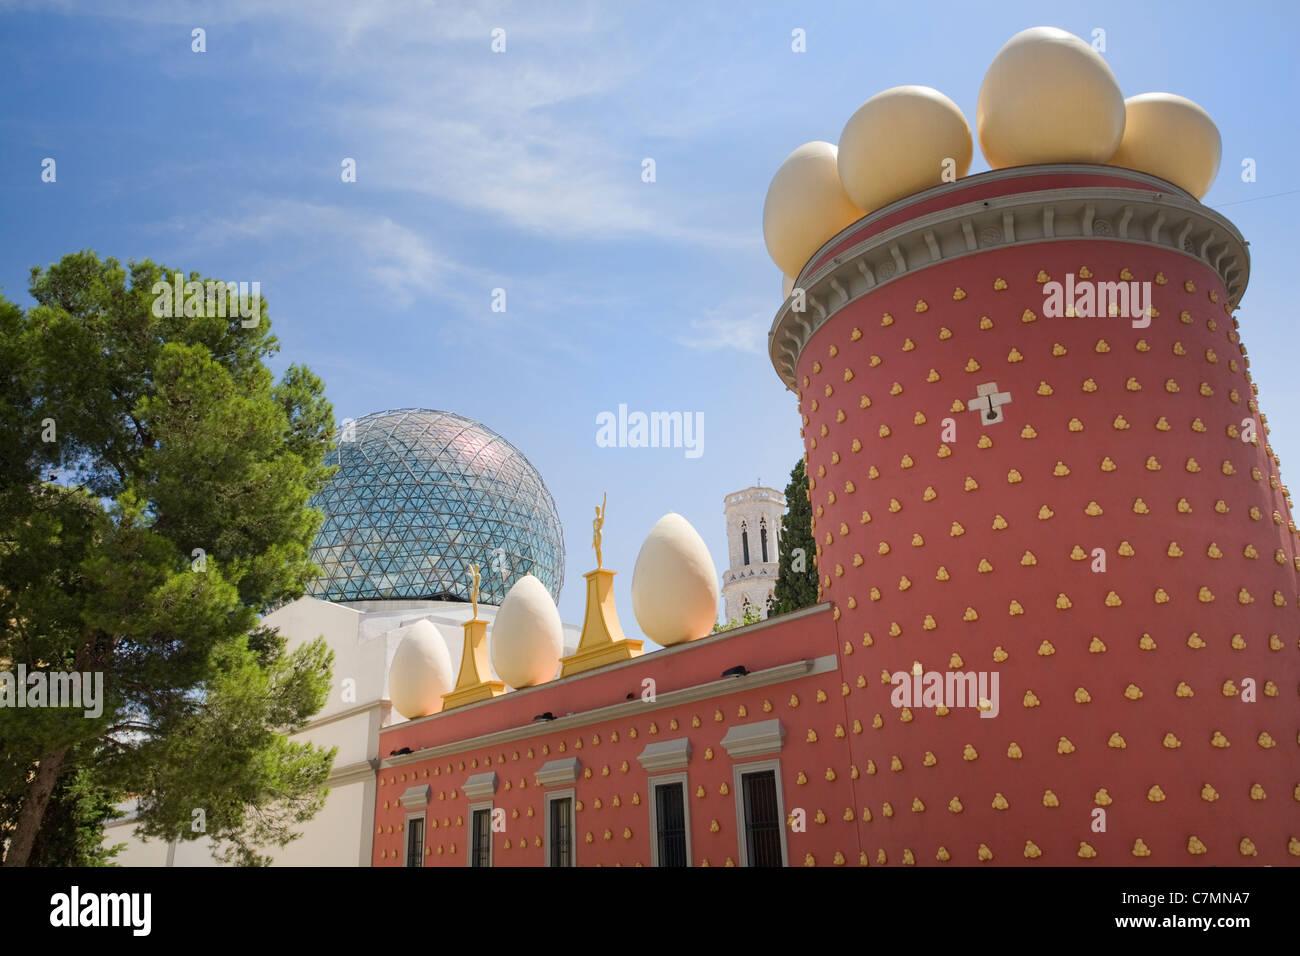 Teatre-Museu Dali, Figueres, Catalonia, Spain - Stock Image